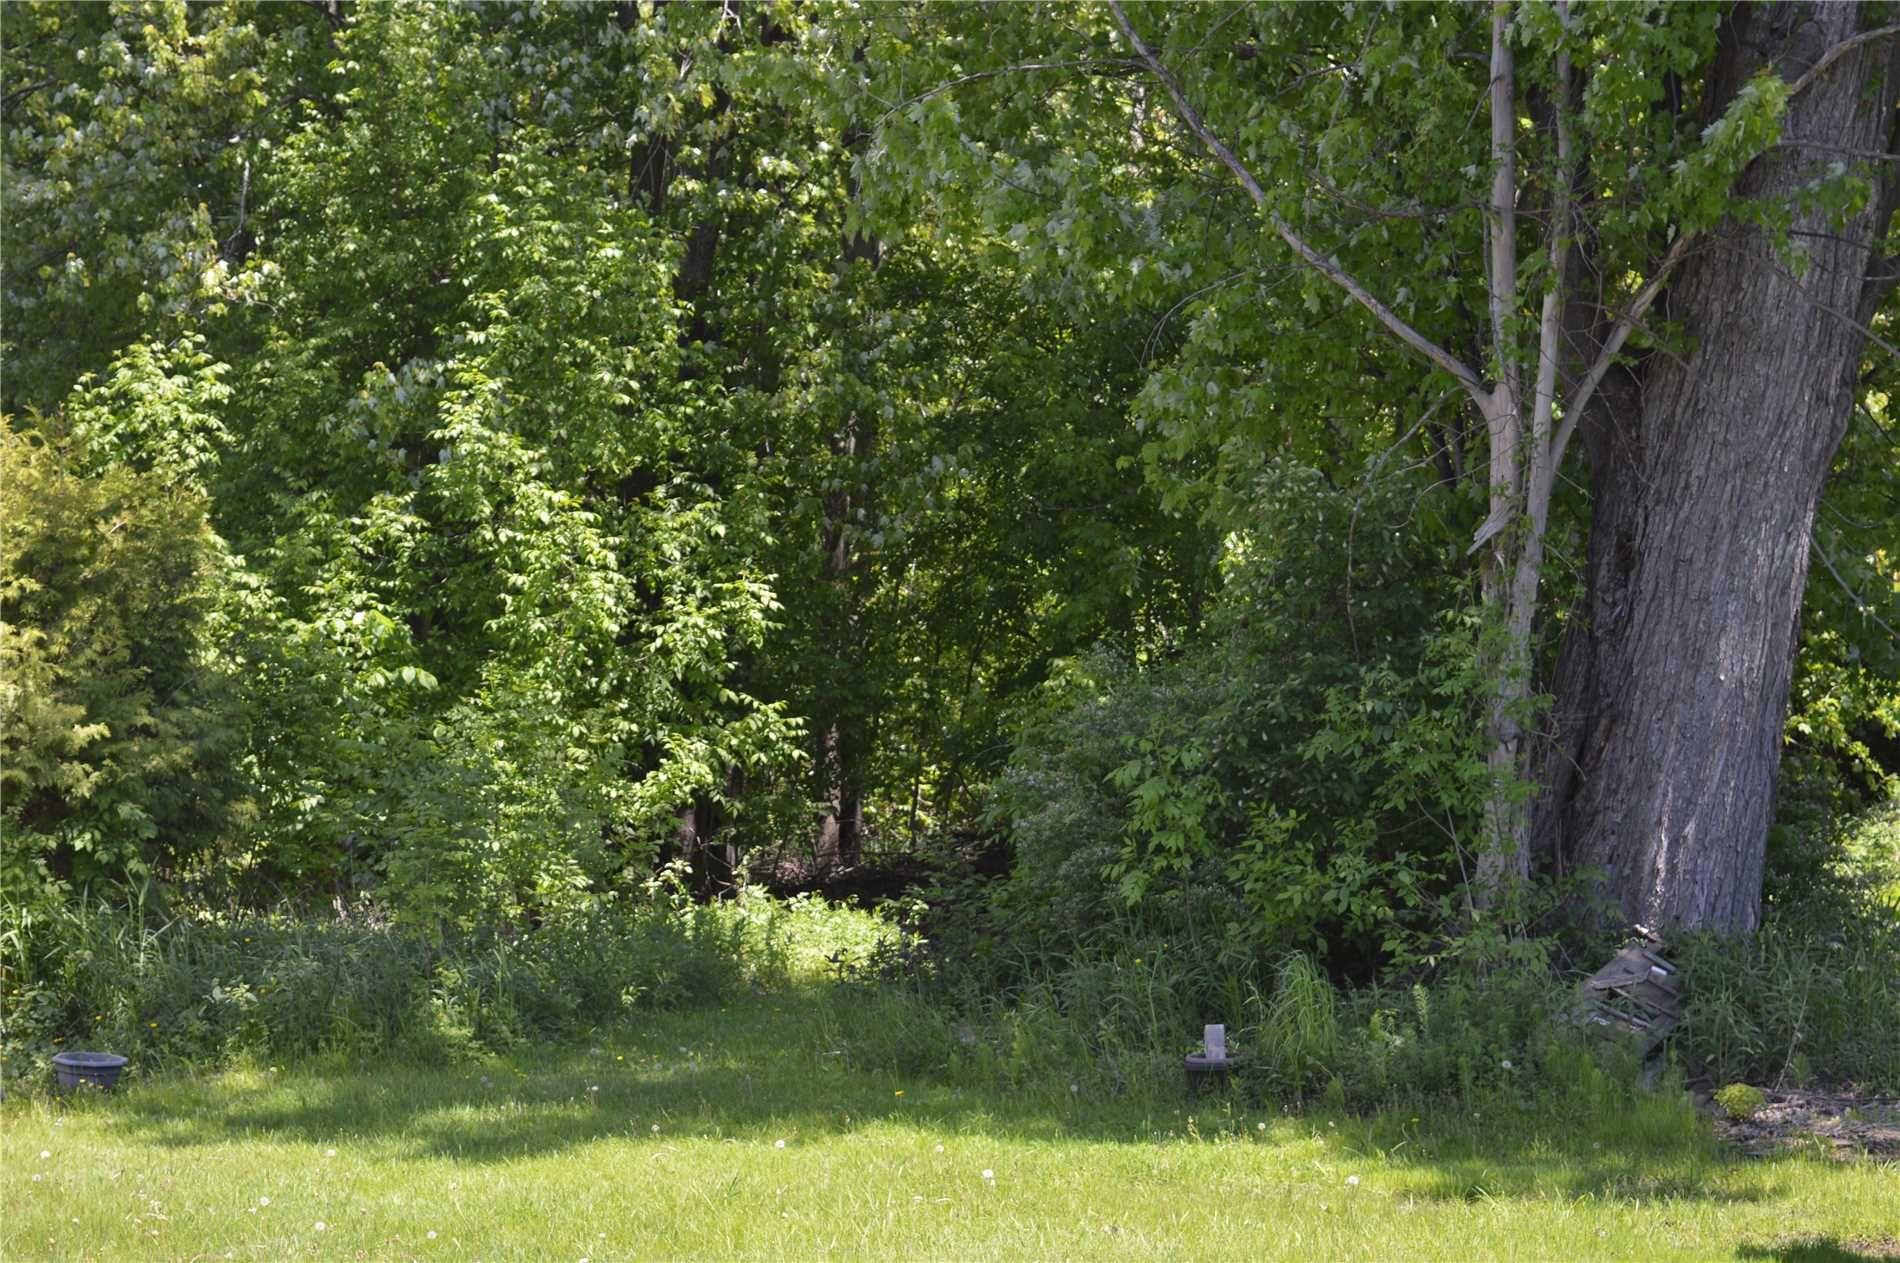 Main Photo: 2675 Lakeshore Drive in Ramara: Brechin Property for sale : MLS®# S4481993